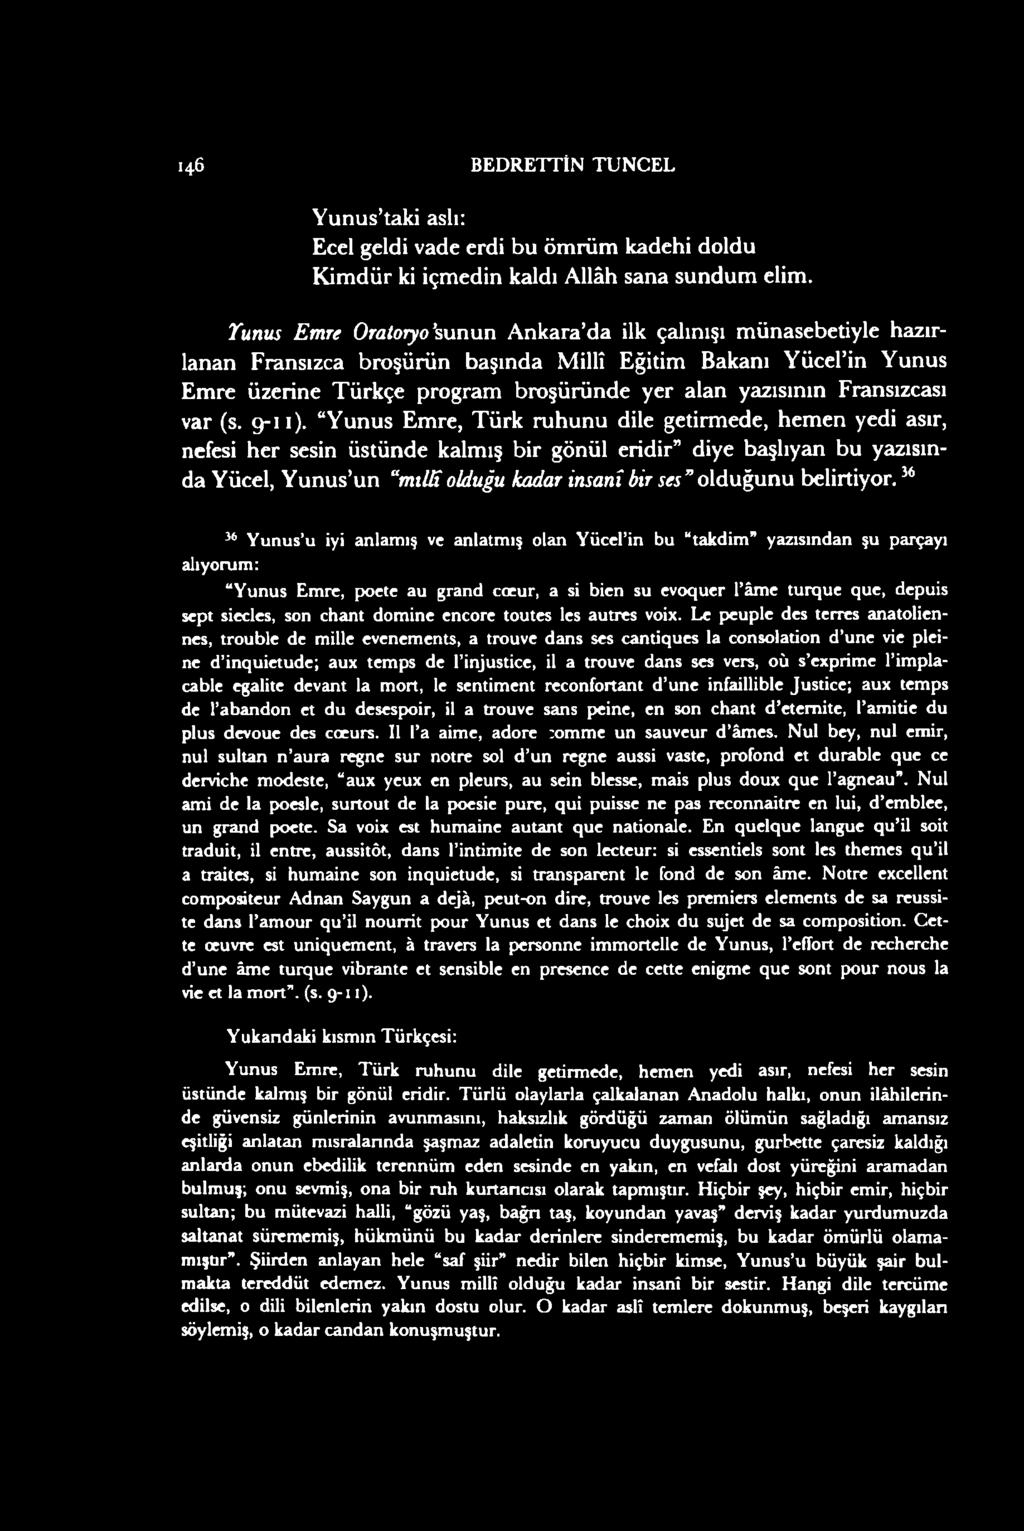 Fransizca Da Yunus Emre* - Pdf Free Download tout Salon Bas De Jardin Pas Cher